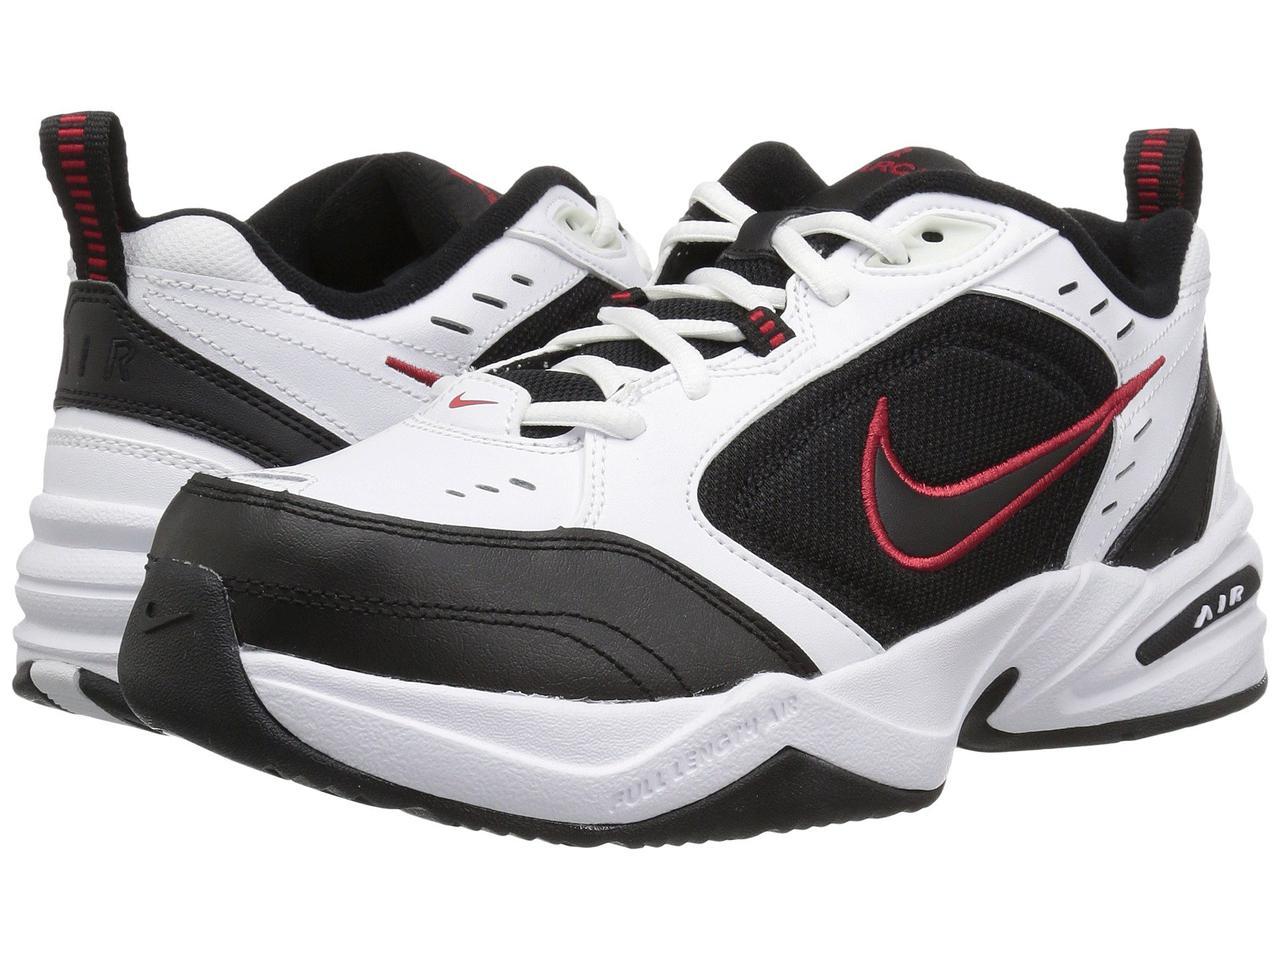 083dba4b5fdf Кроссовки Кеды (Оригинал) Nike Air Monarch IV White Black-Varsity ...